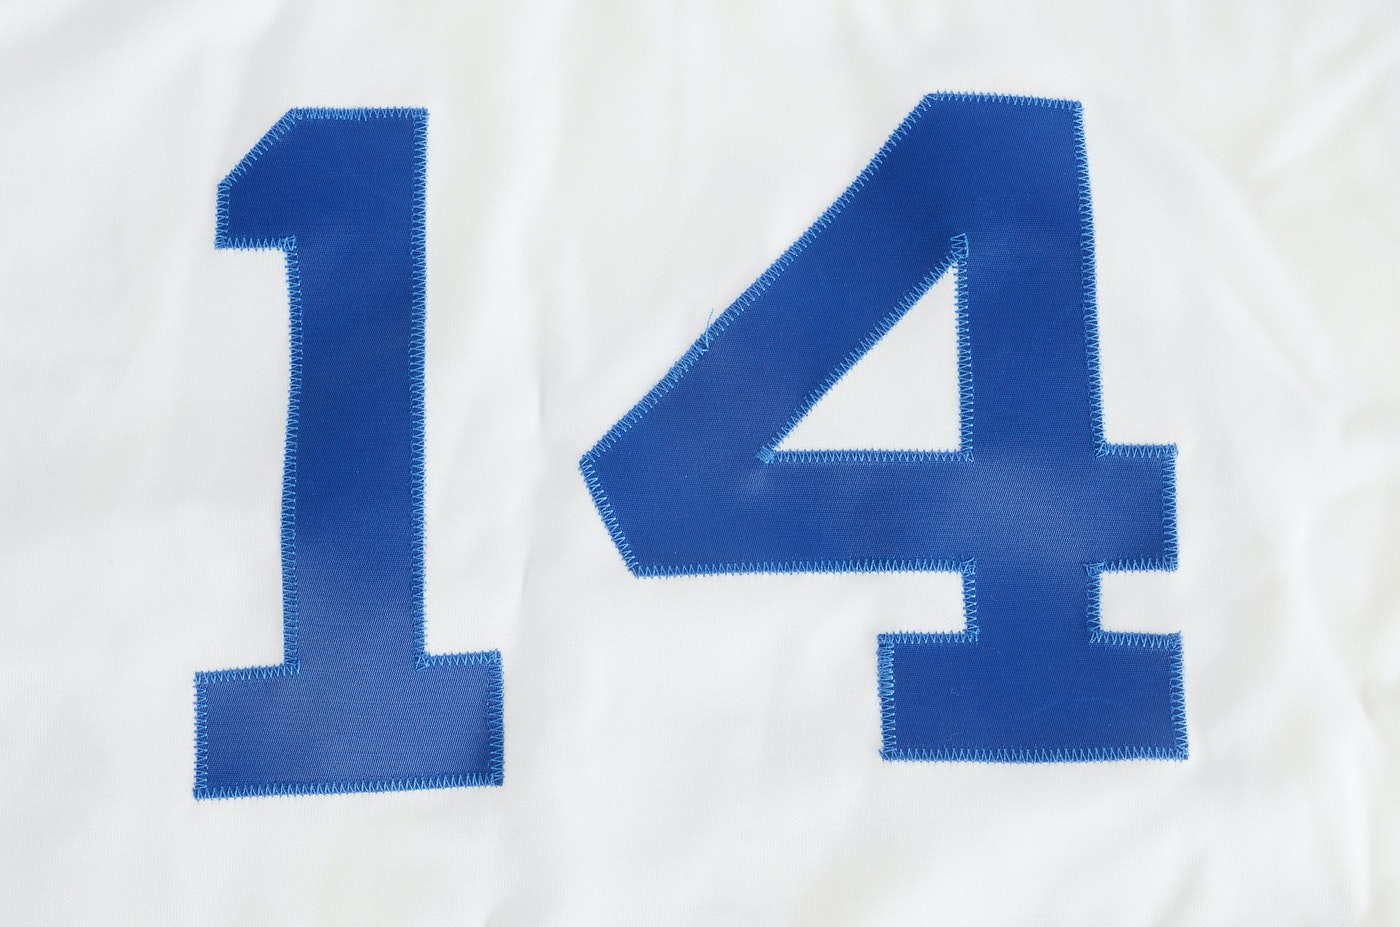 80165726 besides Basketball Men's College furthermore Varsity village together with 4875041 Hof Oscar Robertson Royals Signed Basketball Jersey in addition Nate Archibald 139945 W. on oscar robertson university of cincinnati